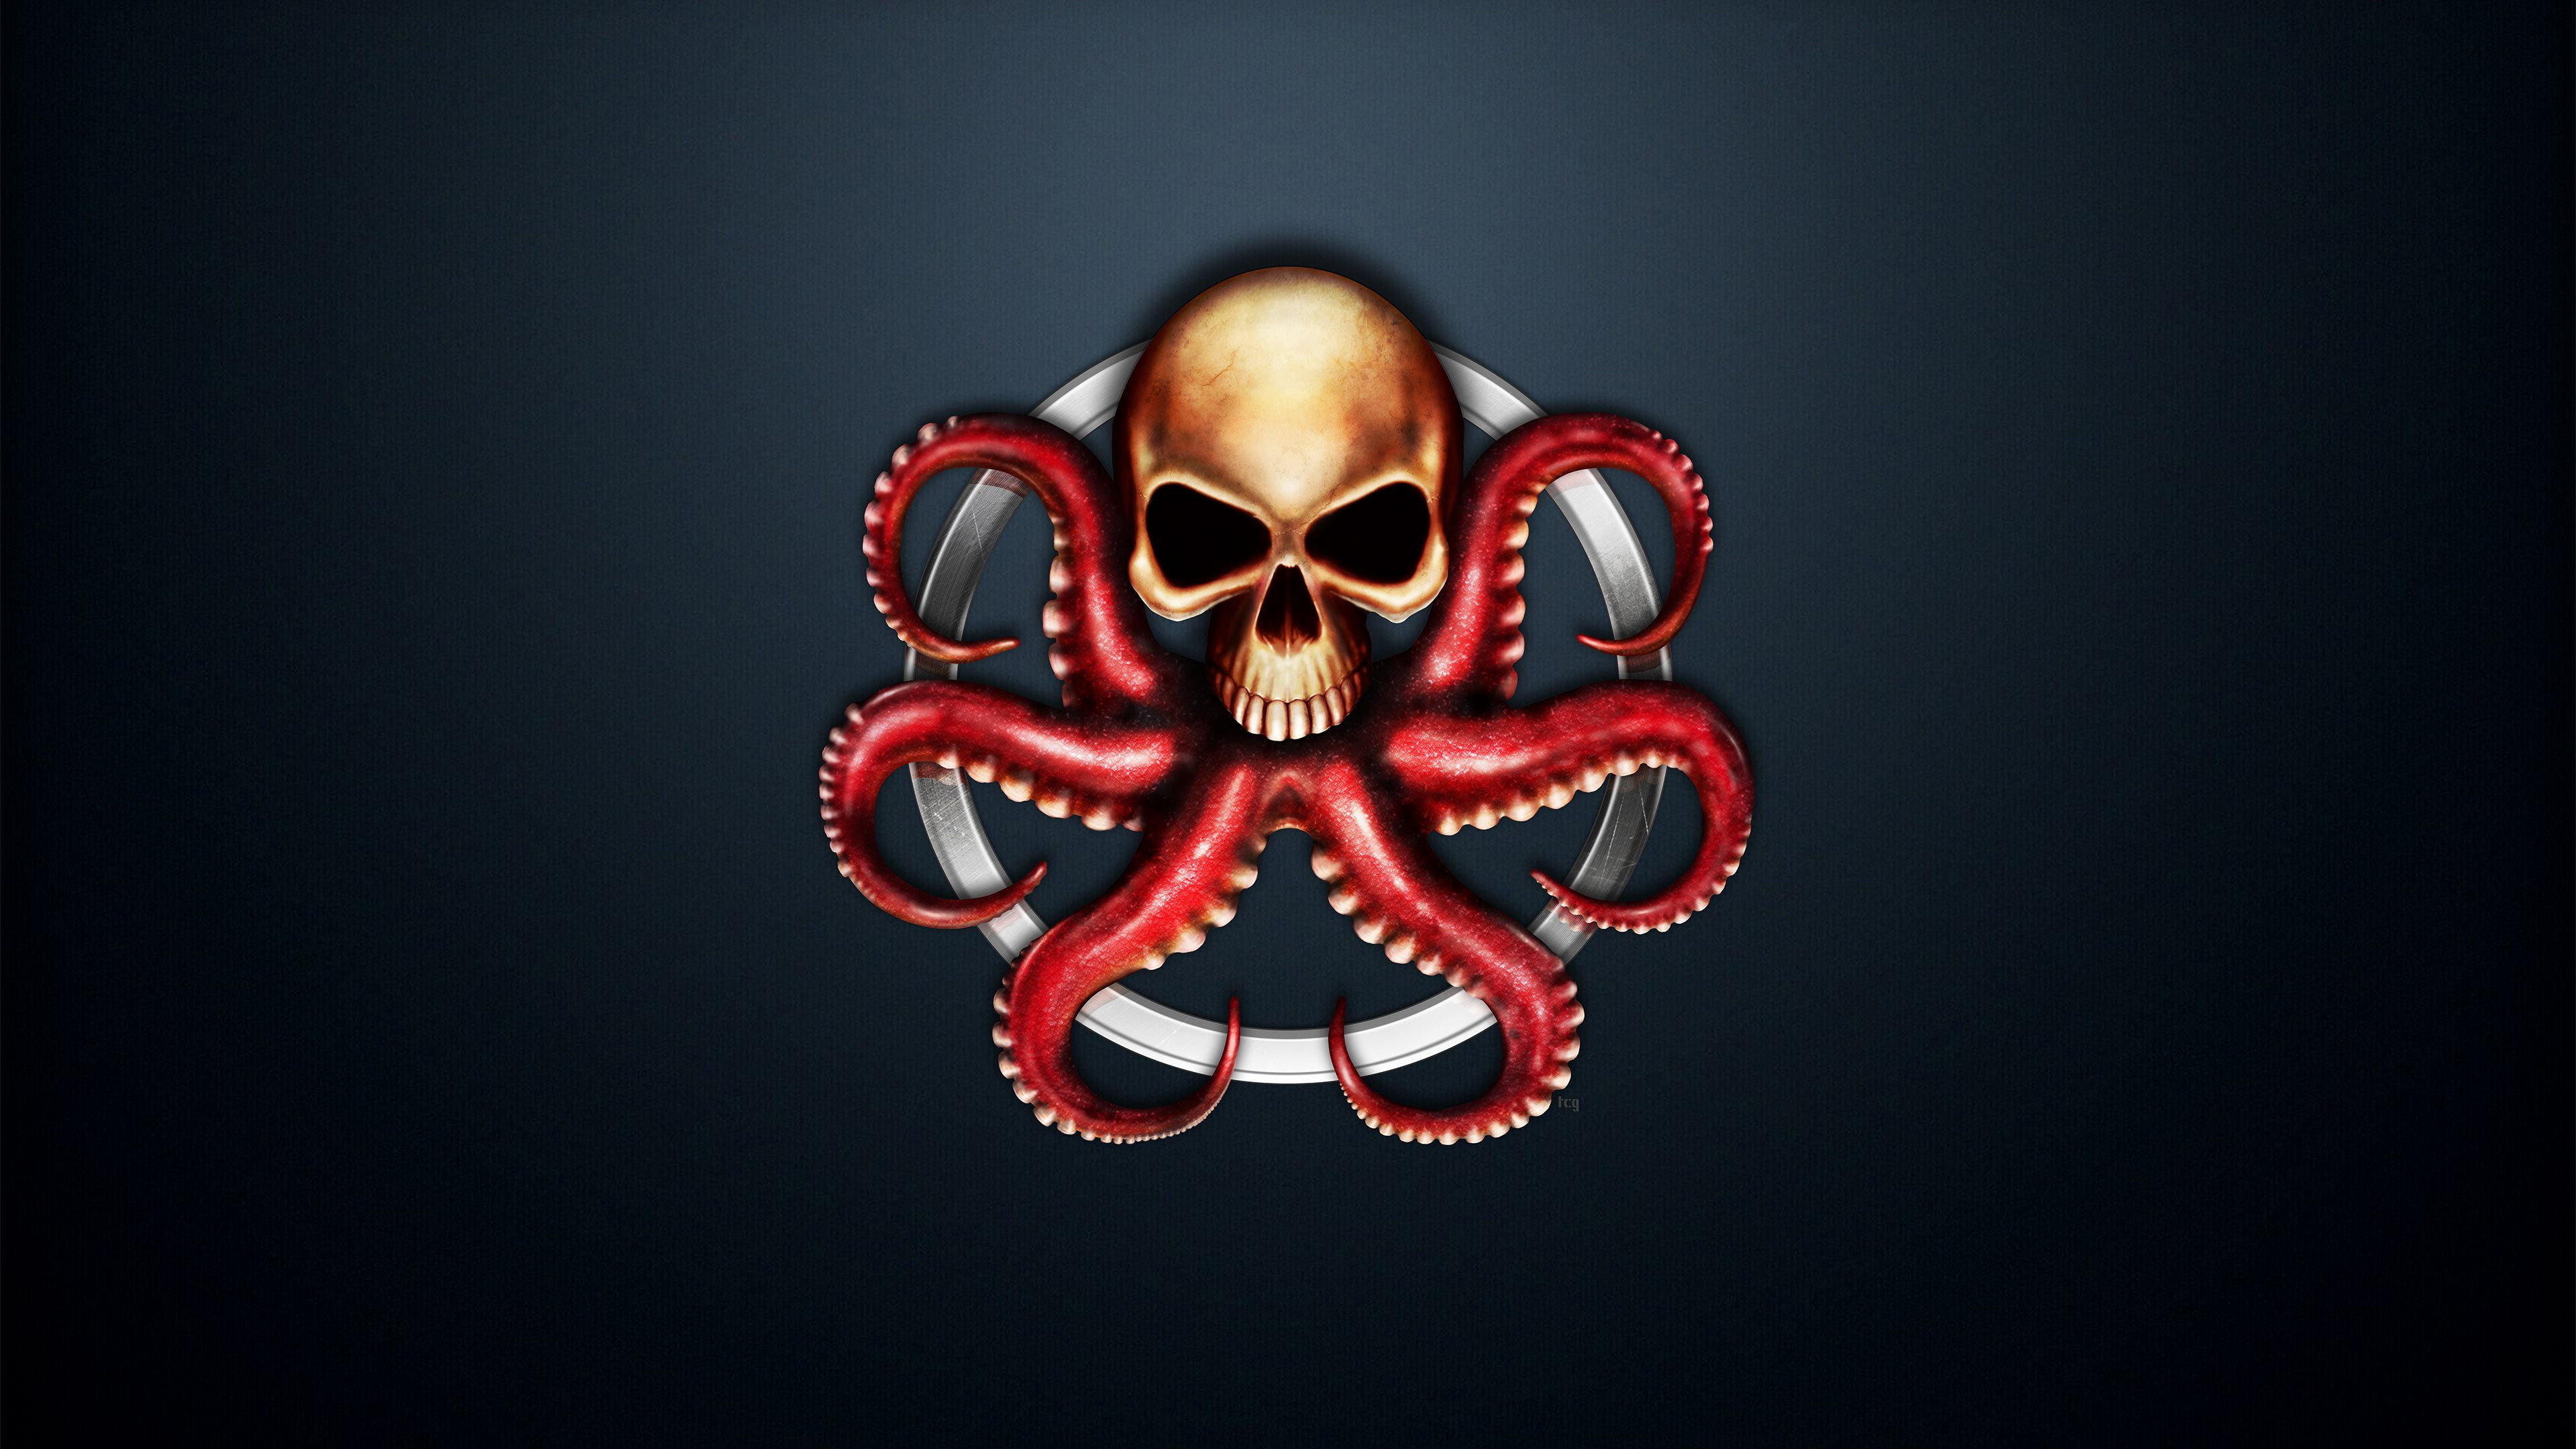 Hydra Logo Wallpaper from Marvel Comics 3840x2160